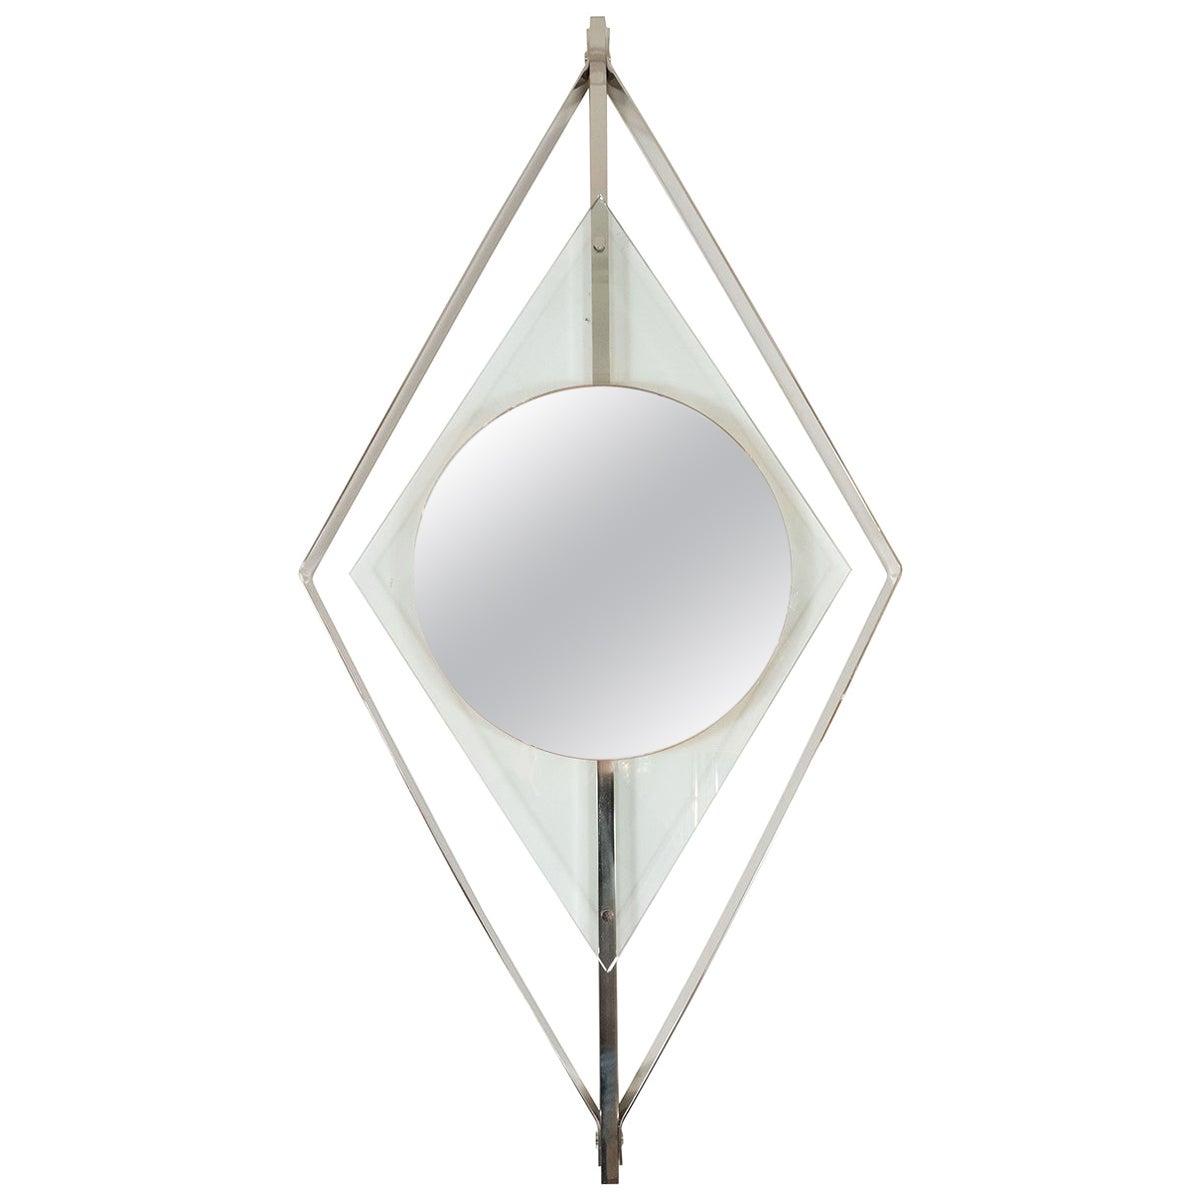 Diamond-Shaped Floating Surround Mirror